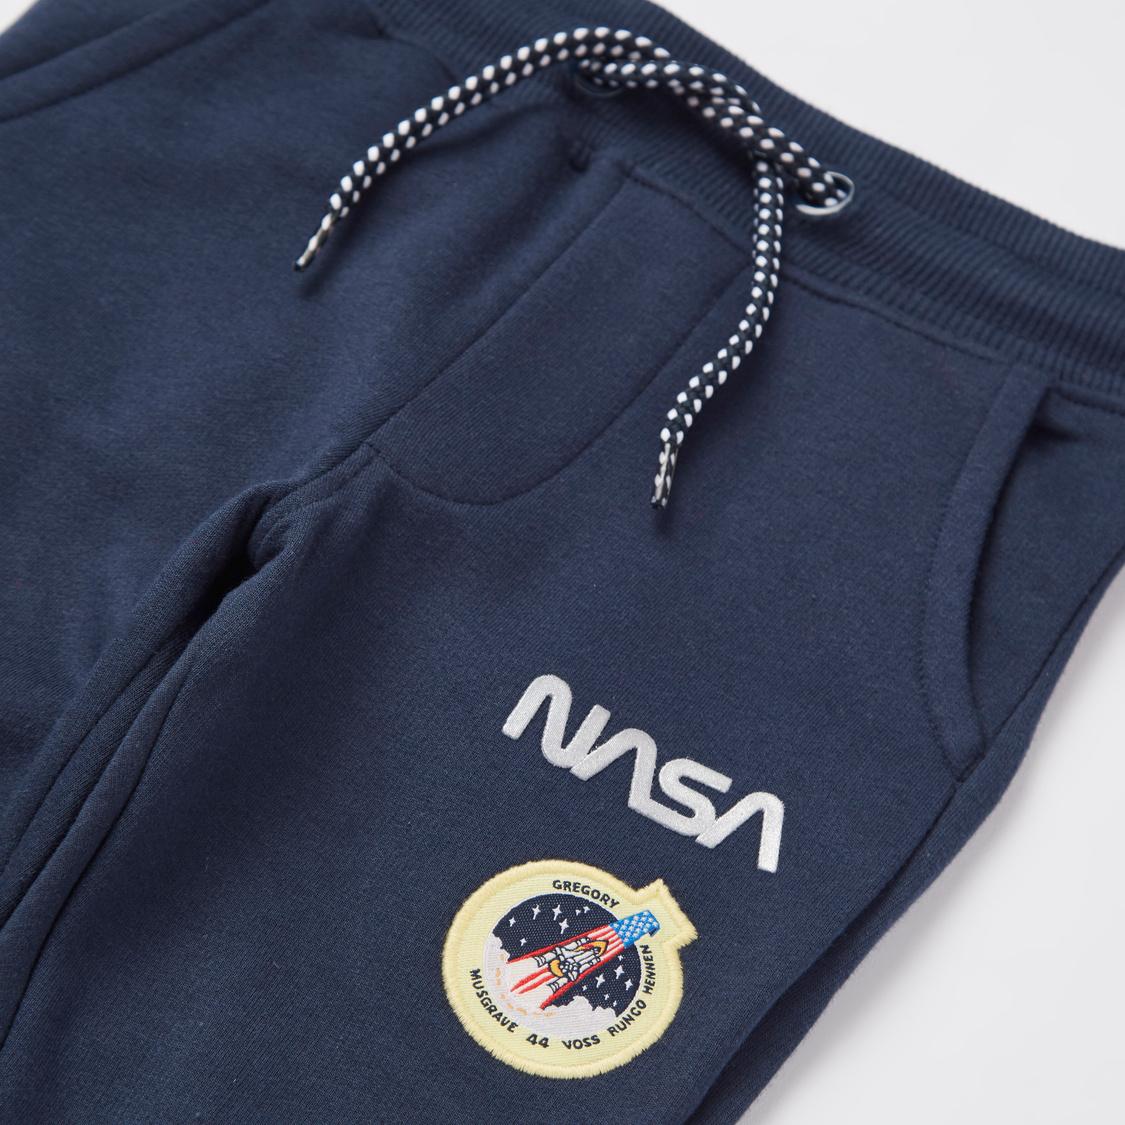 NASA Print Round Neck Sweatshirt and Full Length Jog Pants Set